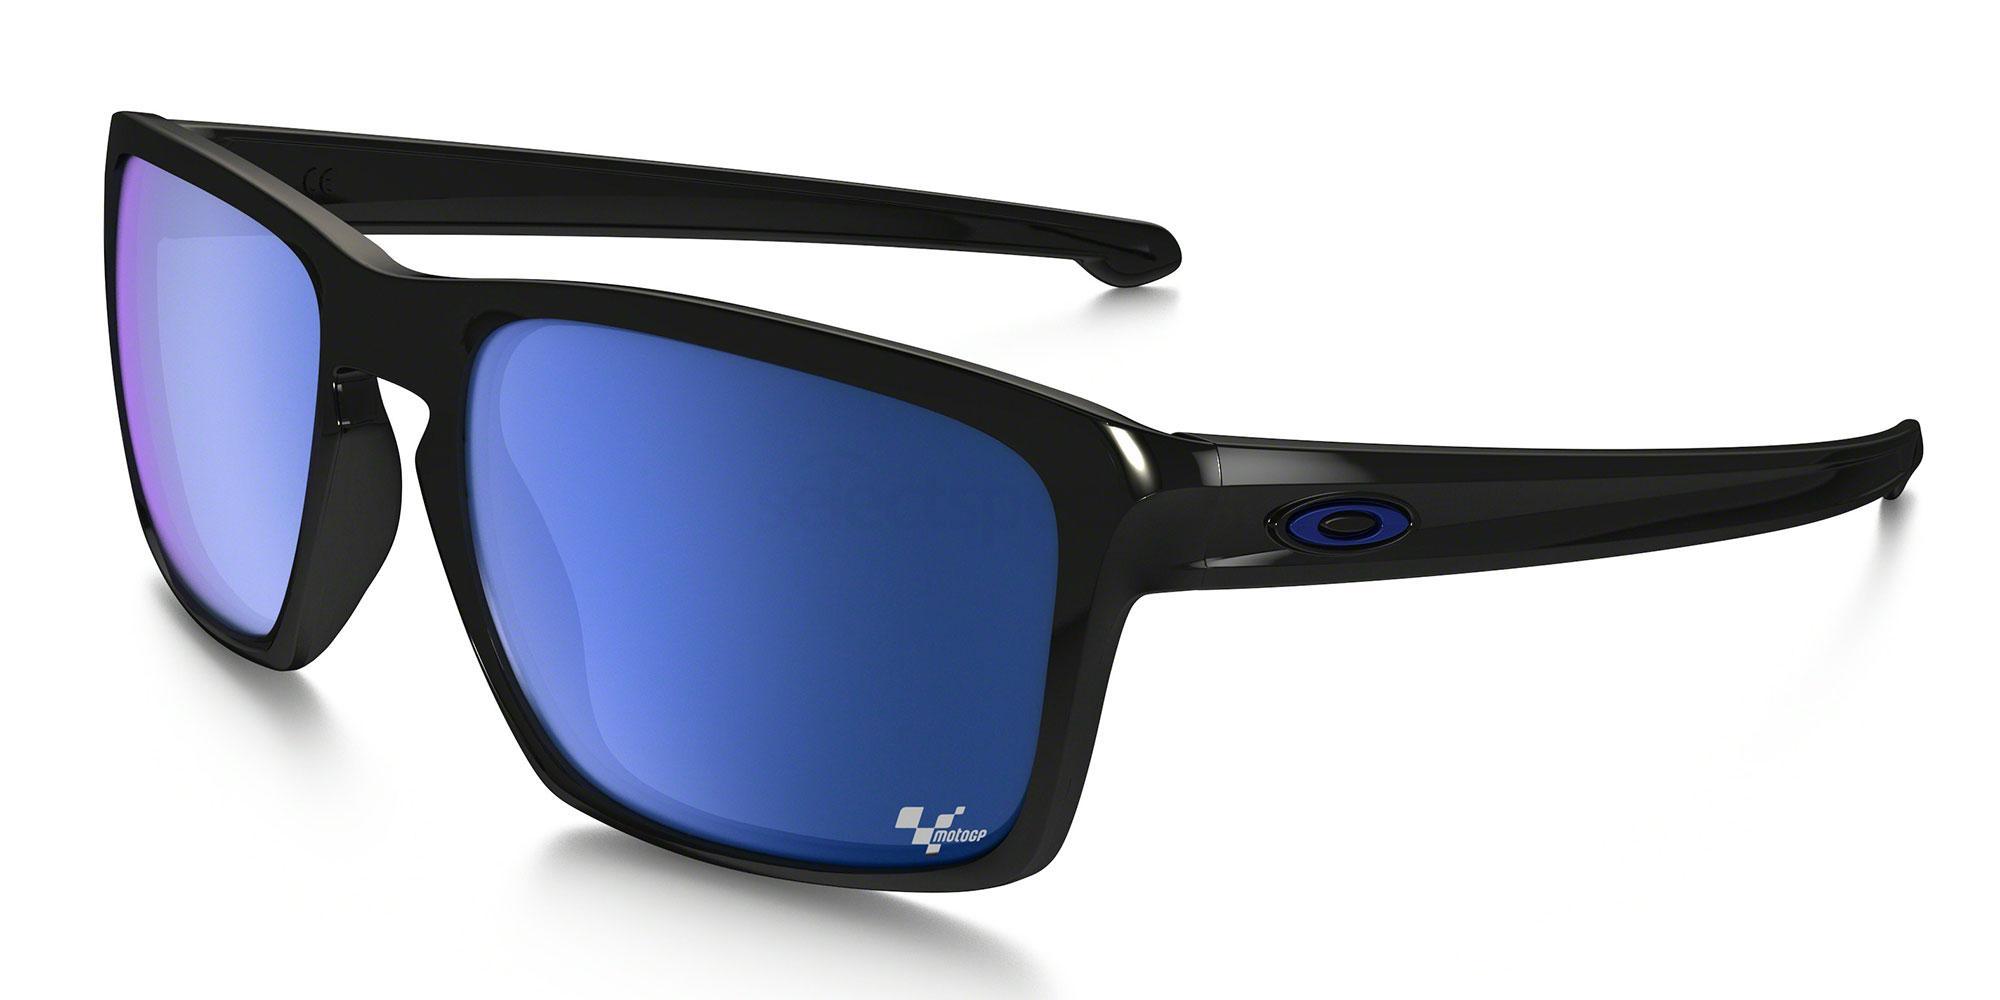 926228 OO9262 SLIVER MOTOGP Sunglasses, Oakley